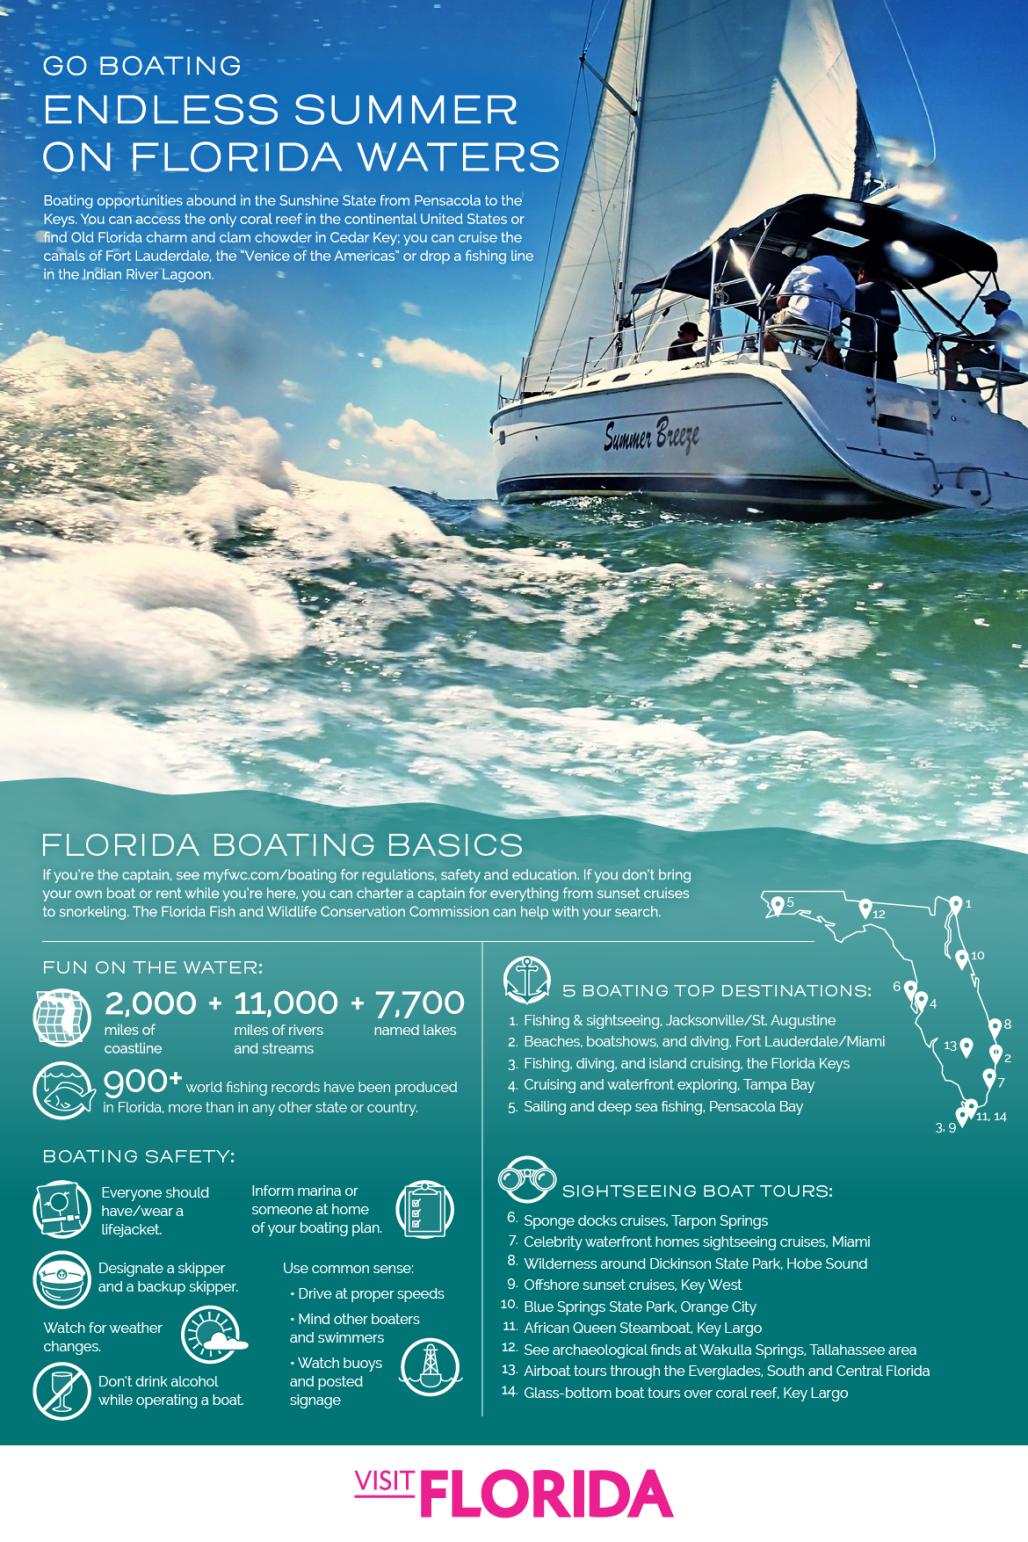 VFAdventures-Boating-FinalV3-web.png